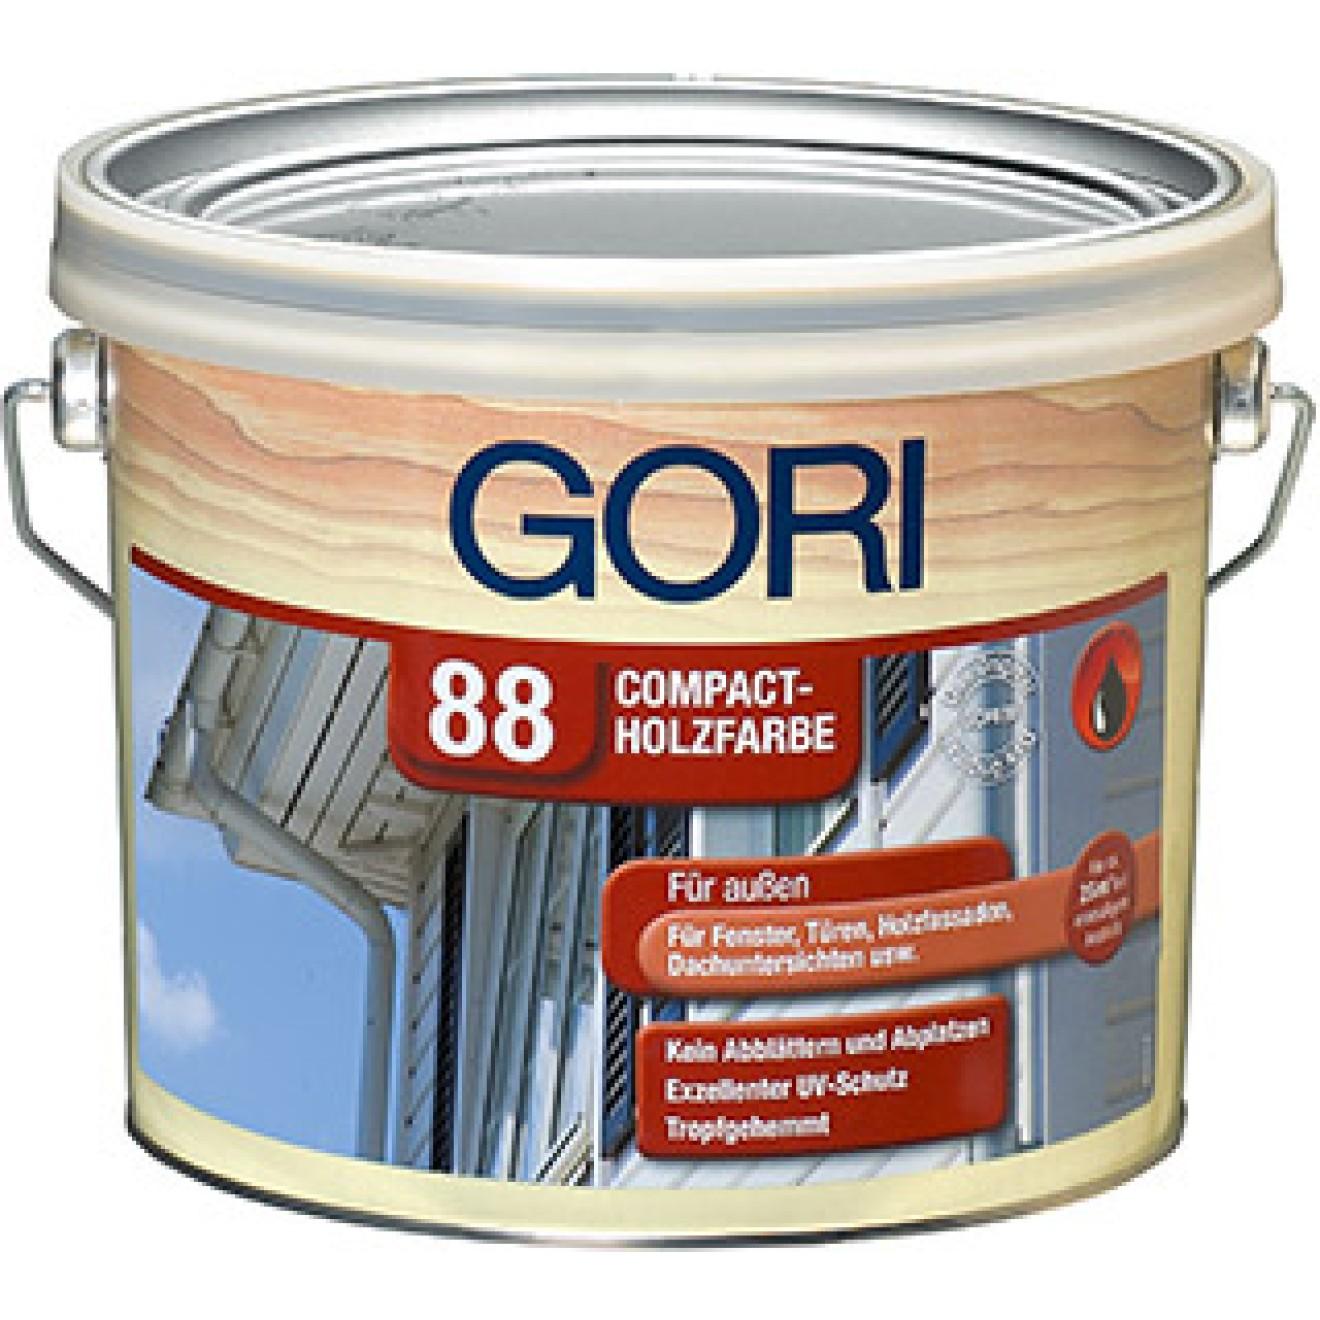 gori 88 compact holzsfarbe das original in deckender ausf hrung. Black Bedroom Furniture Sets. Home Design Ideas